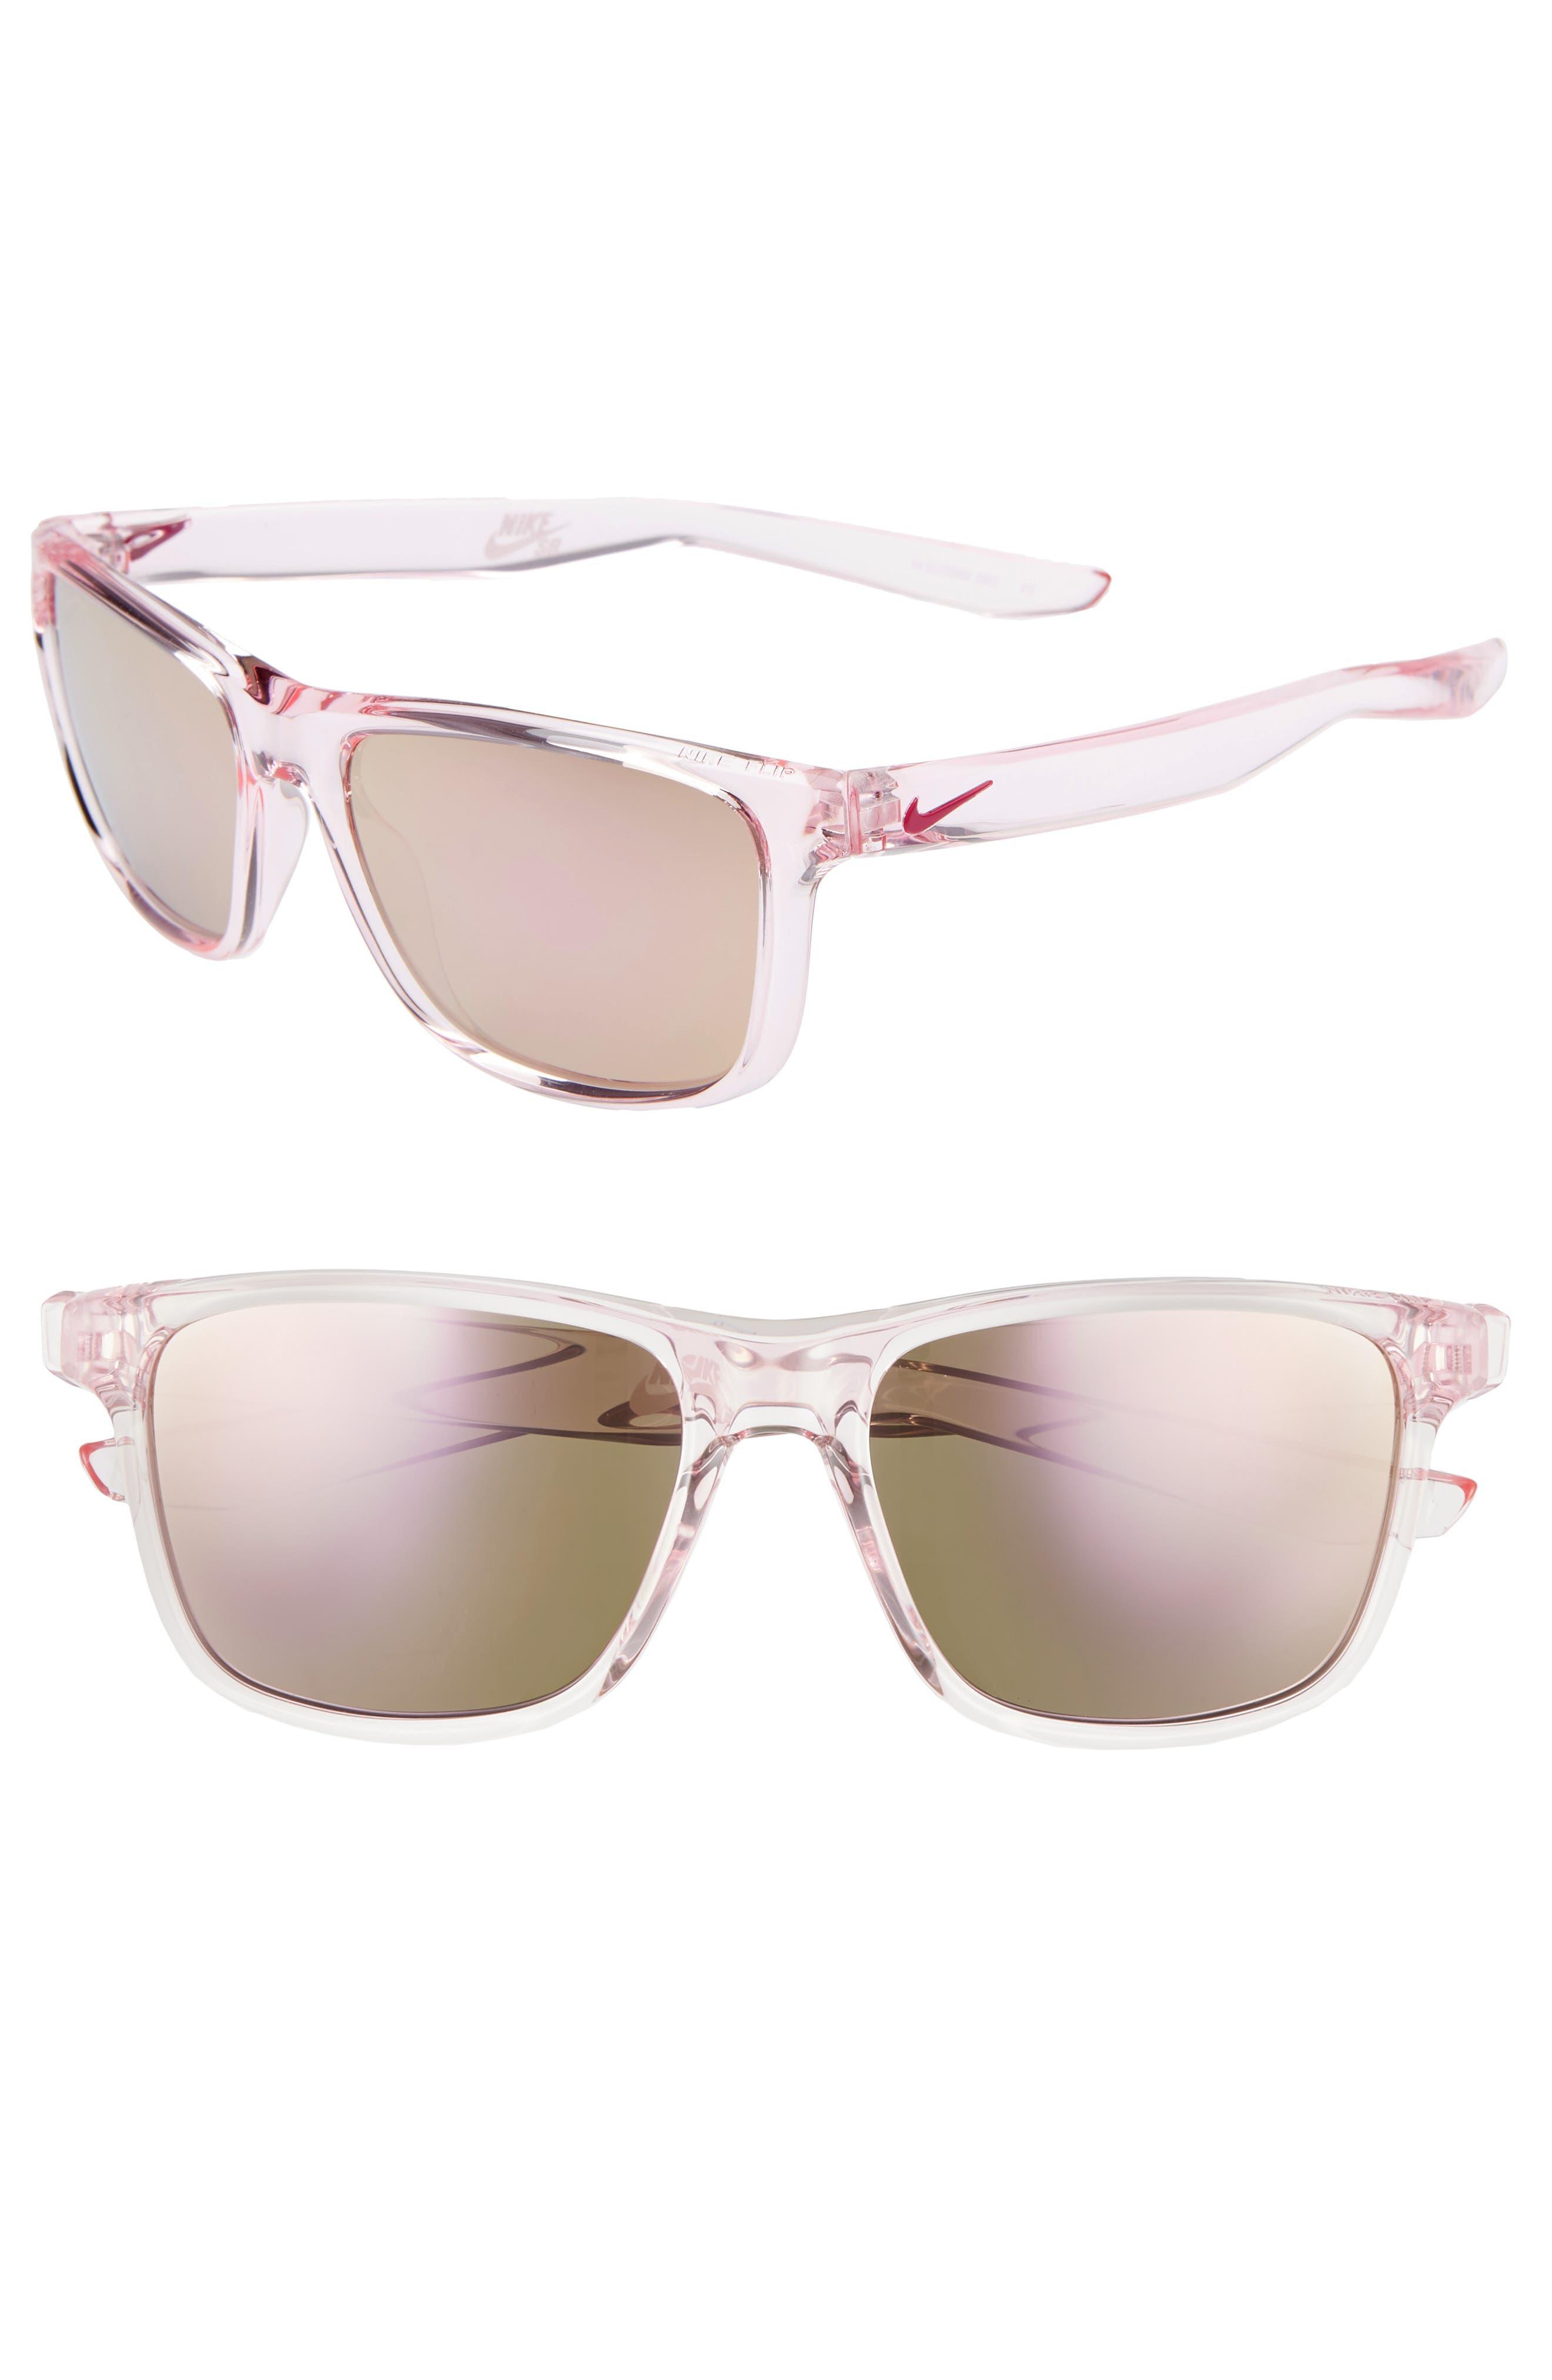 Nike Flip 5m Mirrored Sunglasses - Pink Foam/ Pink